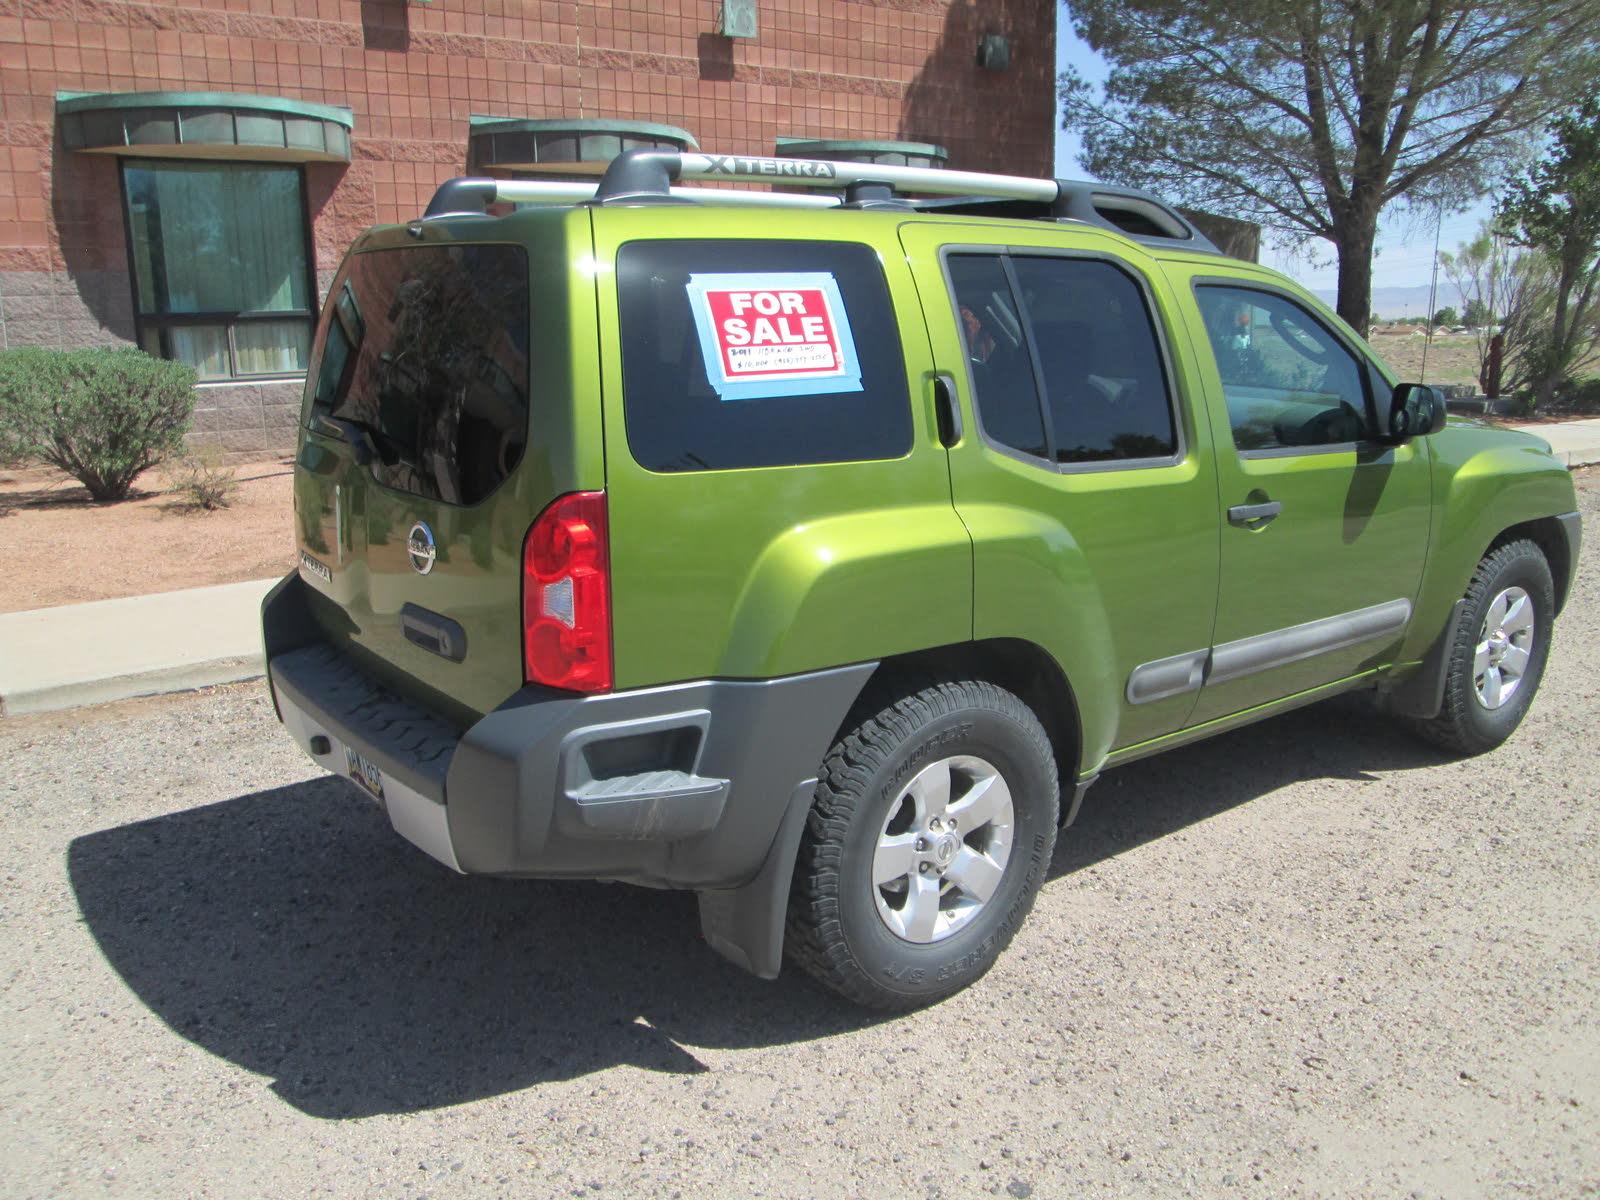 2011 nissan xterra test drive review cargurus 2011 nissan xterra test drive review